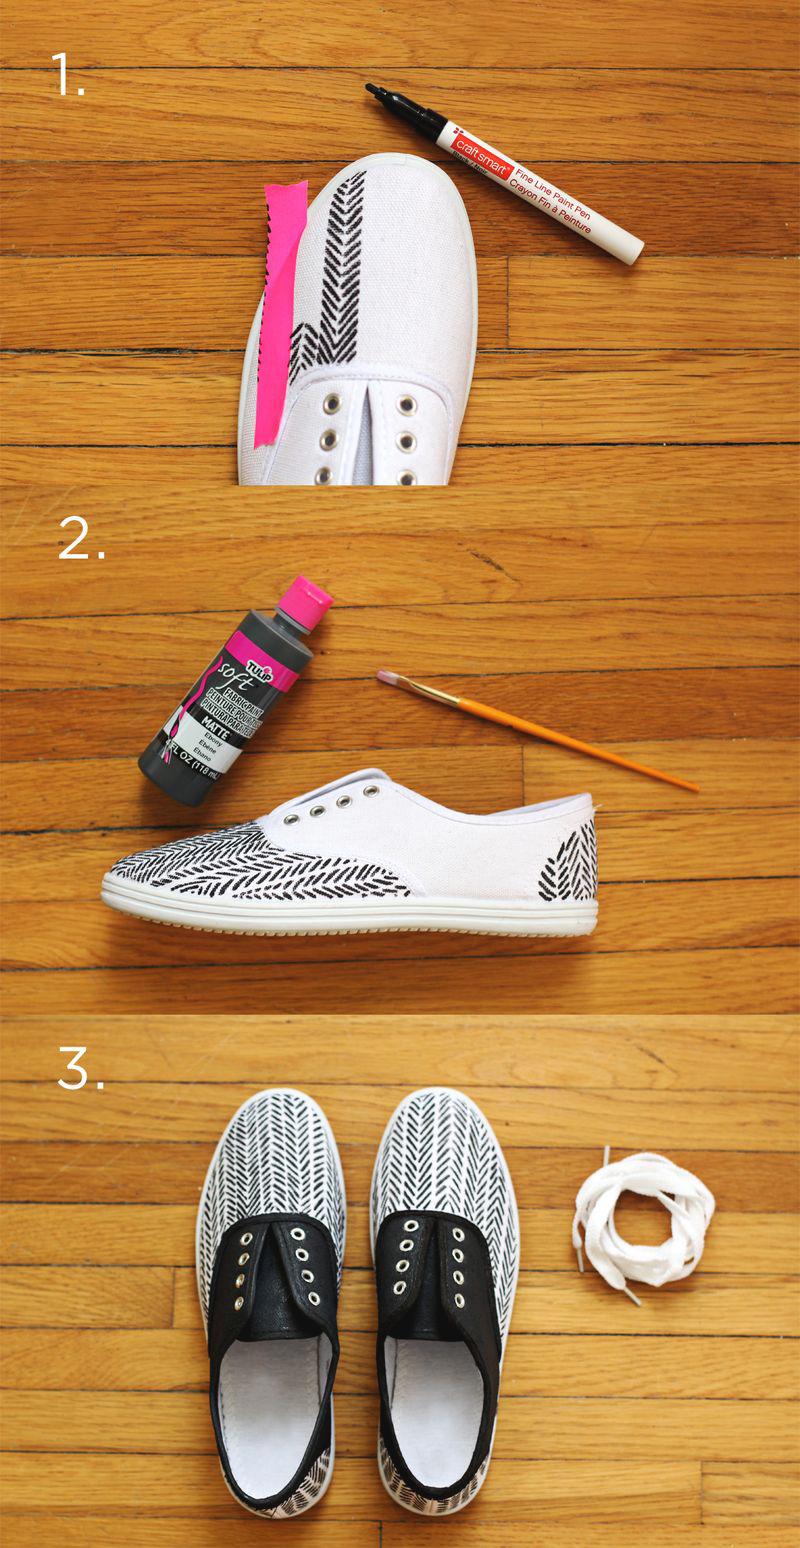 Diy Herringbone Sneakers Supplies Plain Canvas Shoes Fabric Marker